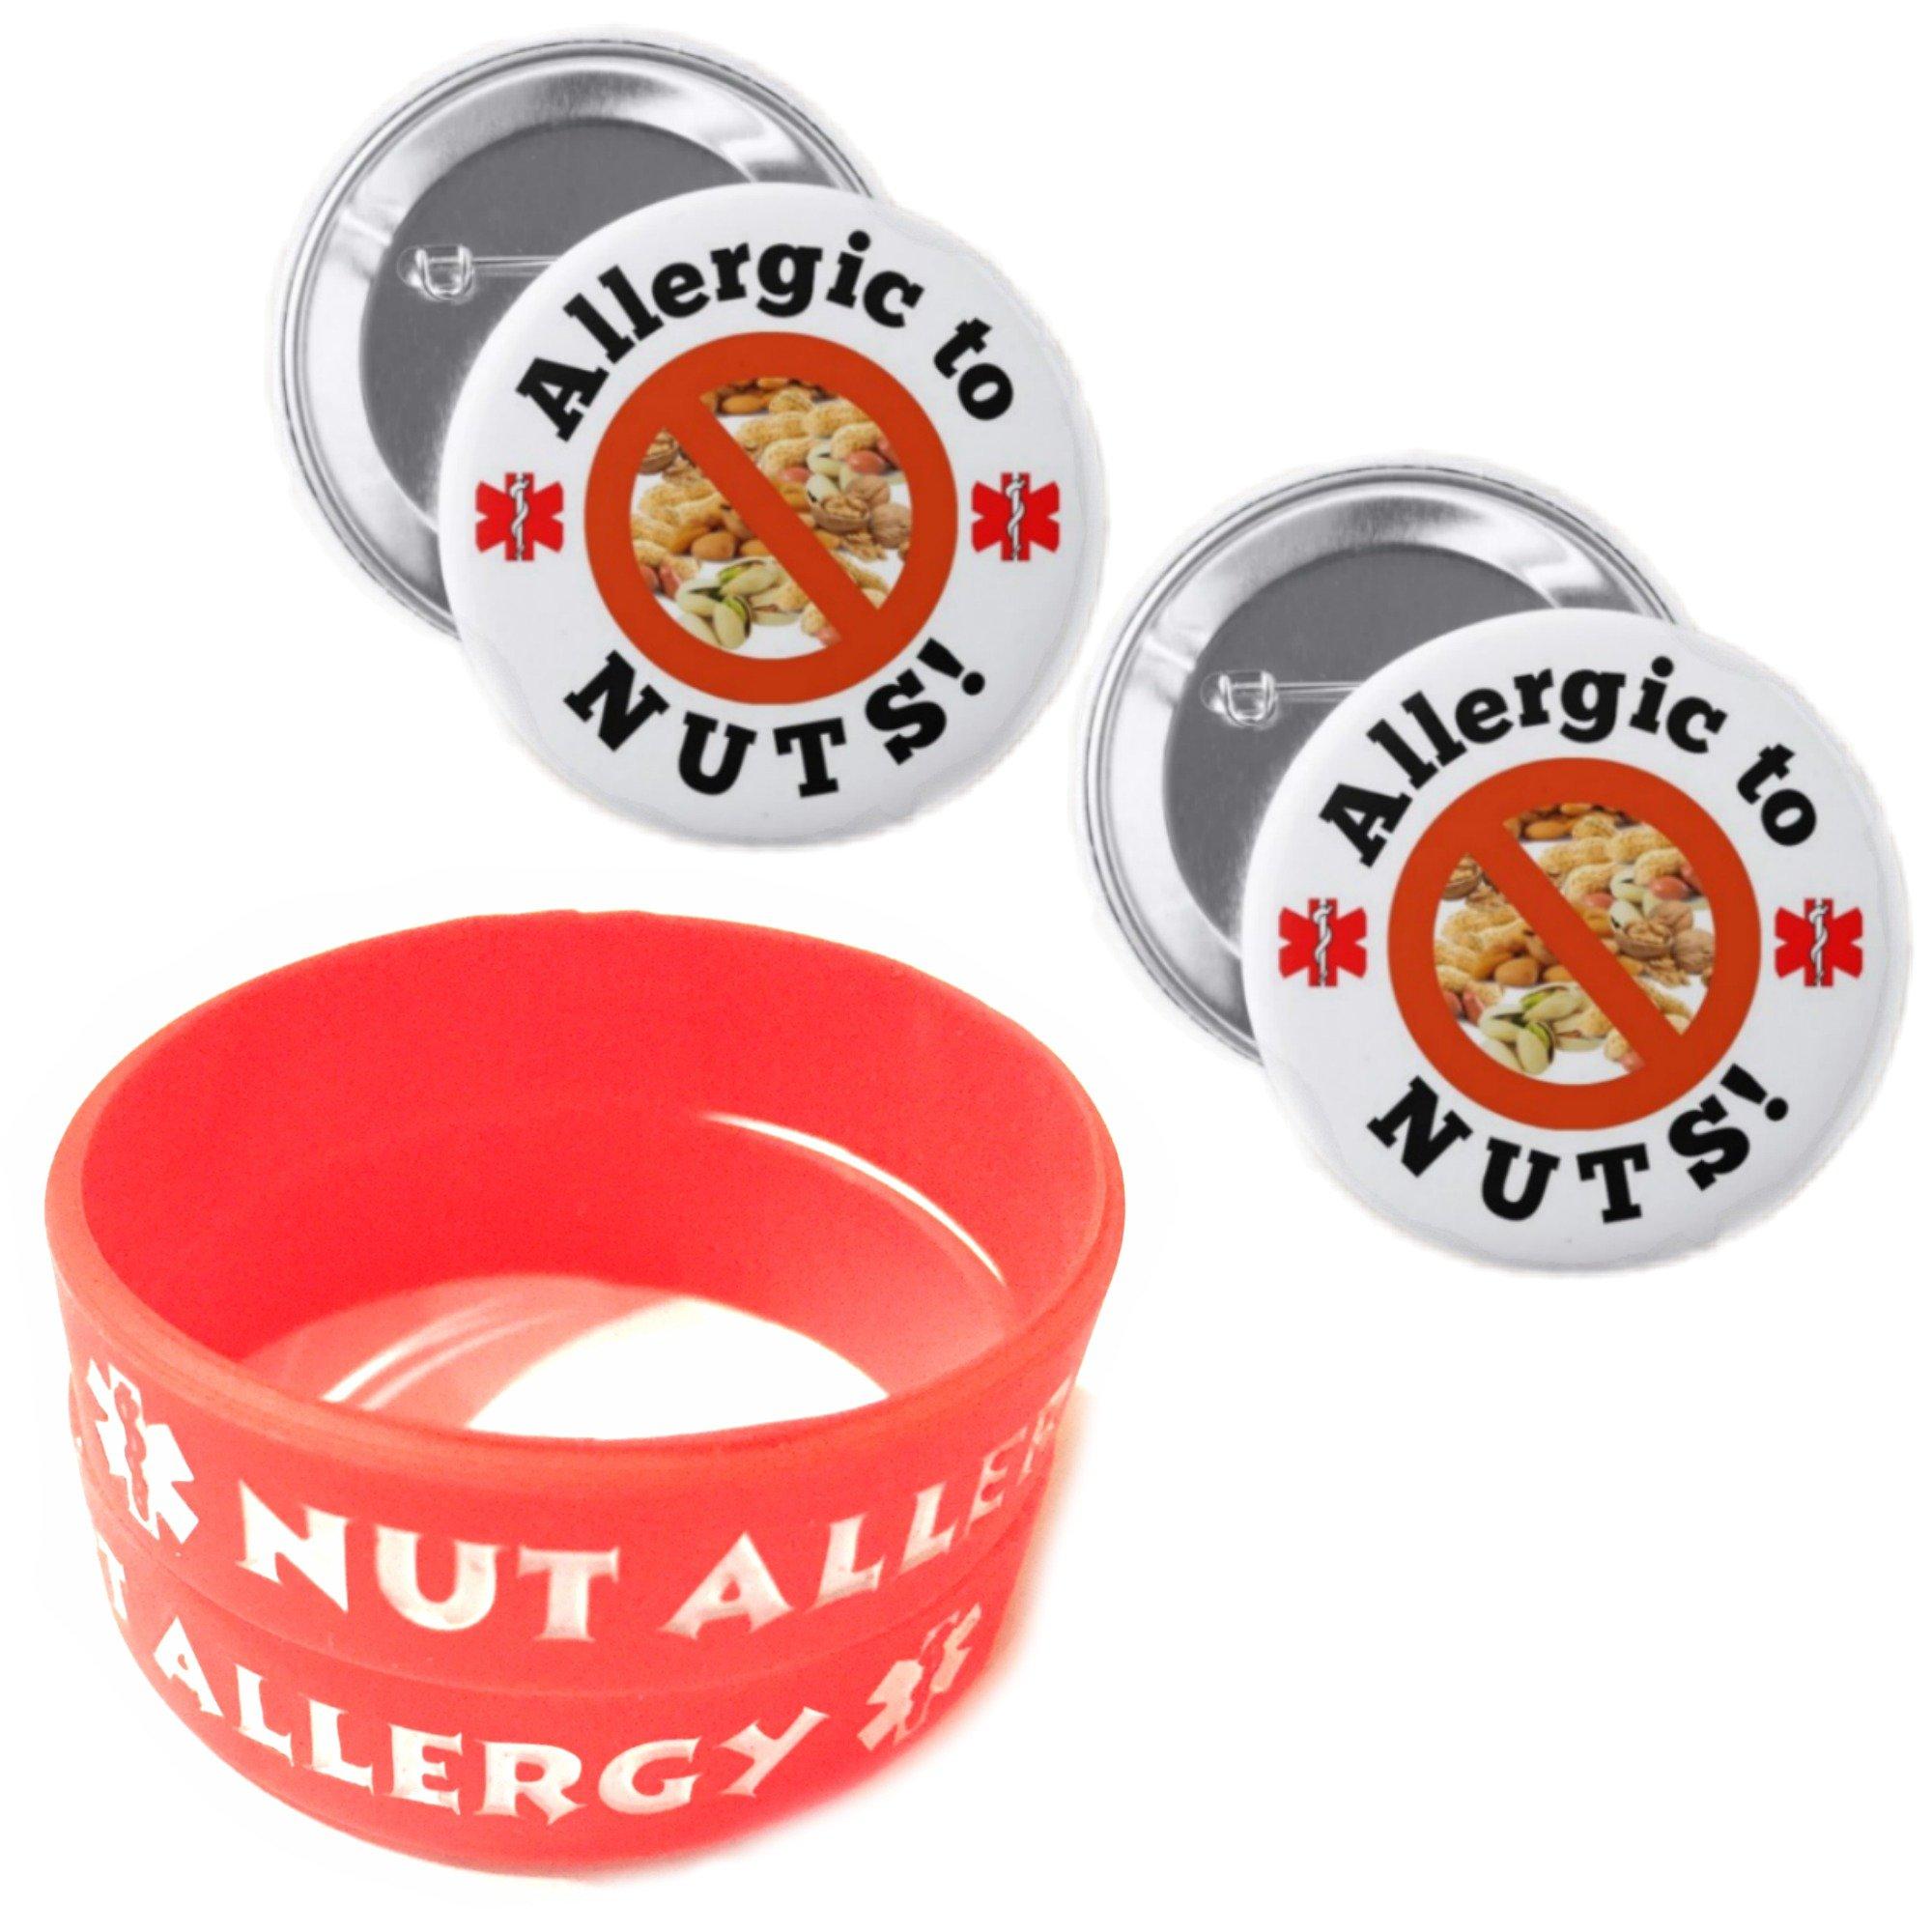 Nut Allergy Bracelets for Kids RED 2pcs Toddler Size/Allergic to Nuts Button Pin 2pcs Medical Alert Bracelets Buttons